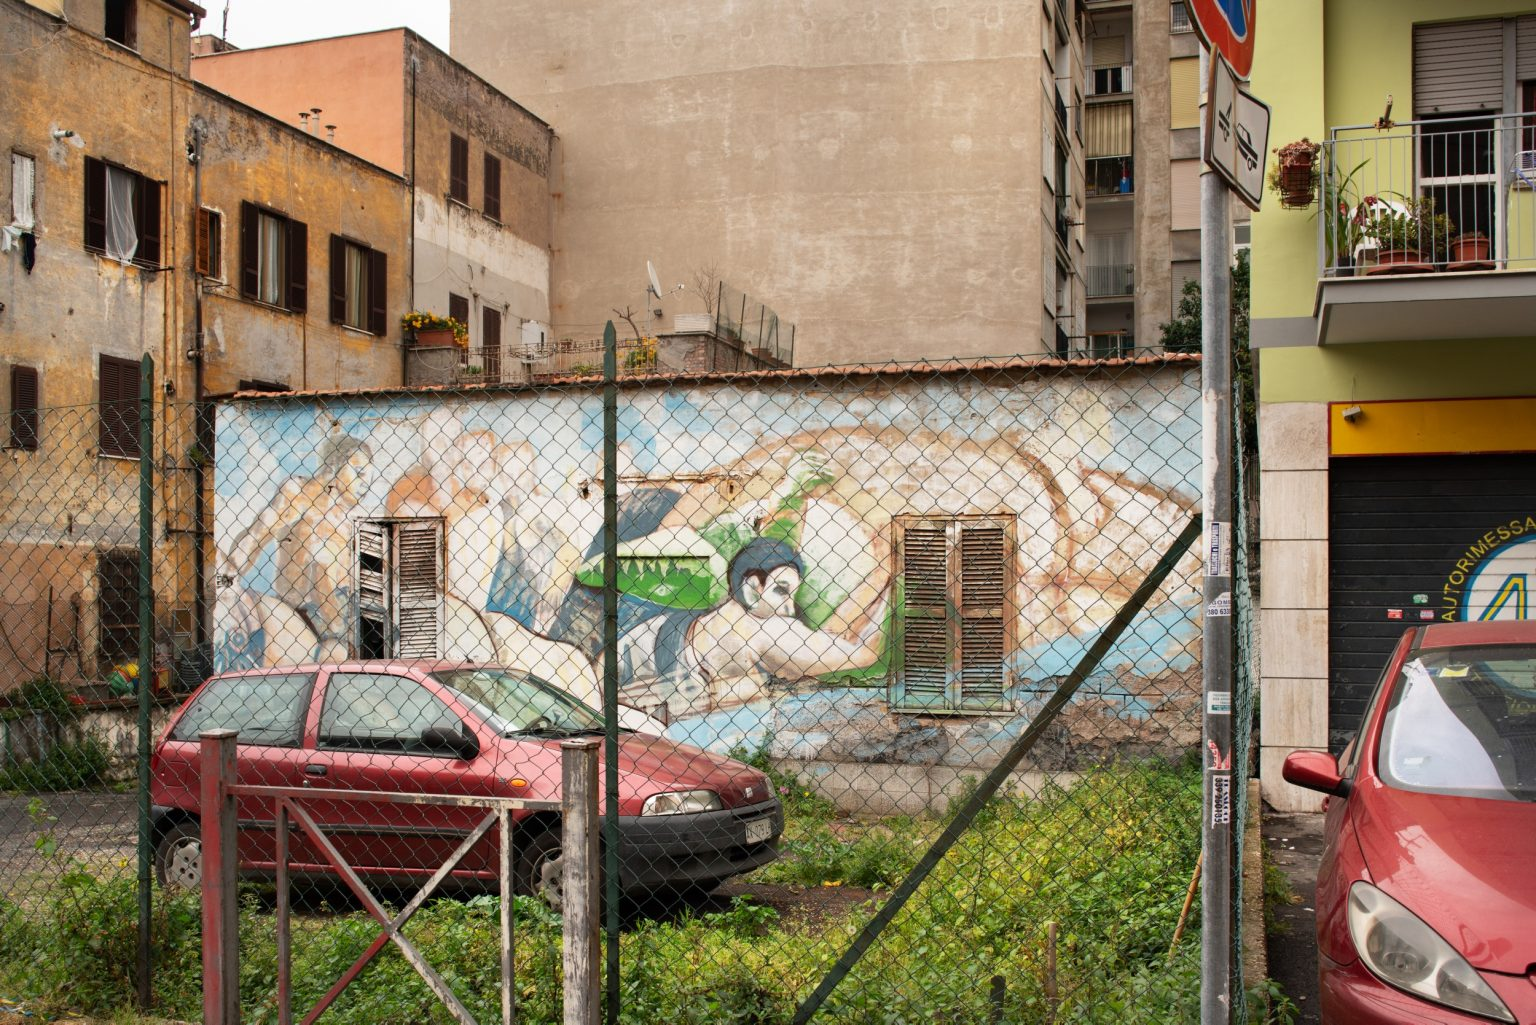 Via Carlo della Rocca, Torpignattara neighborhood. Rome, Italy, 2017